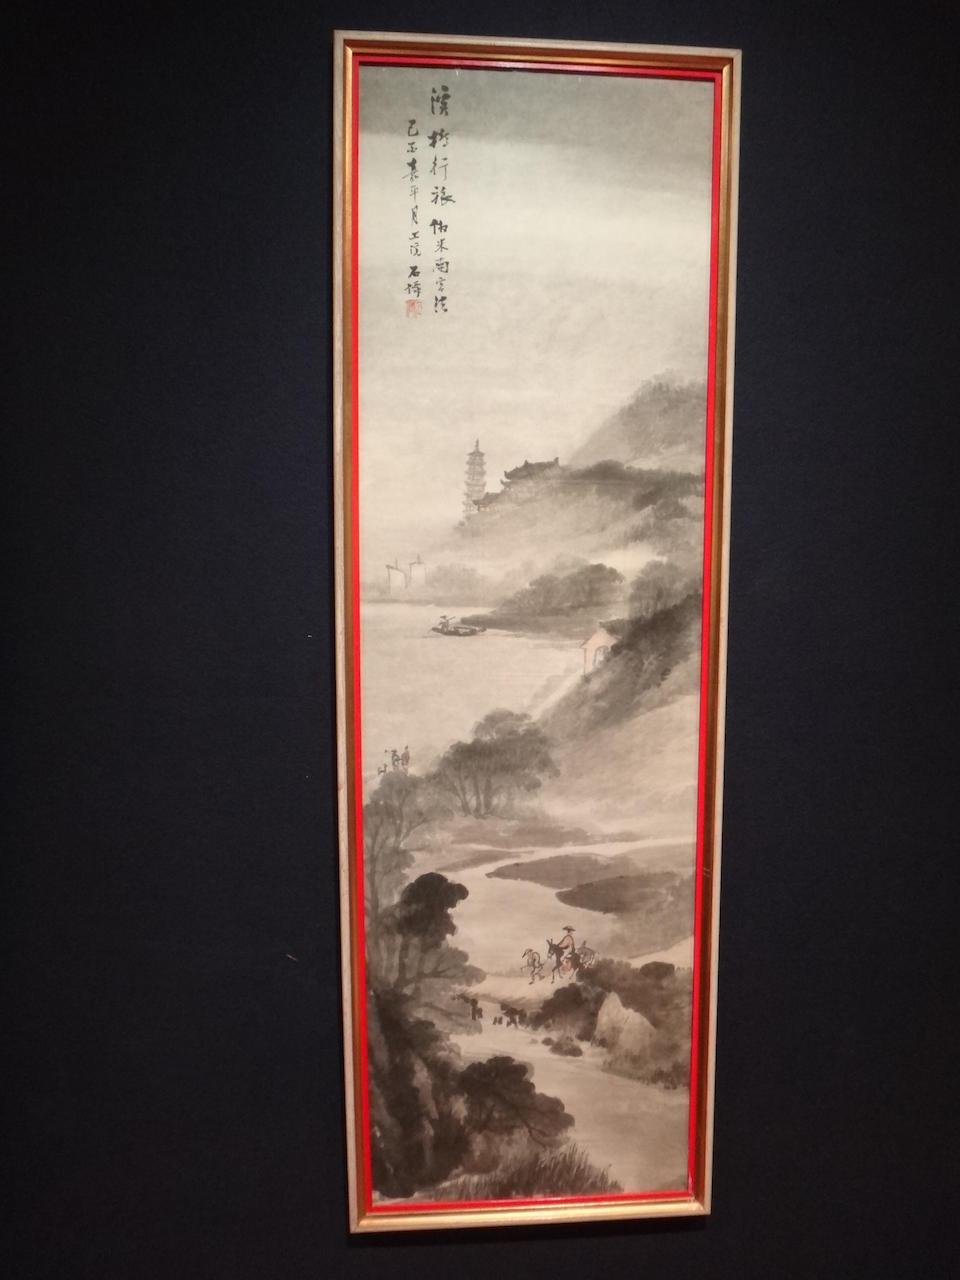 WU SHIXIAN (1856-1919) Traveling among the Rivers and Mountains, 1899